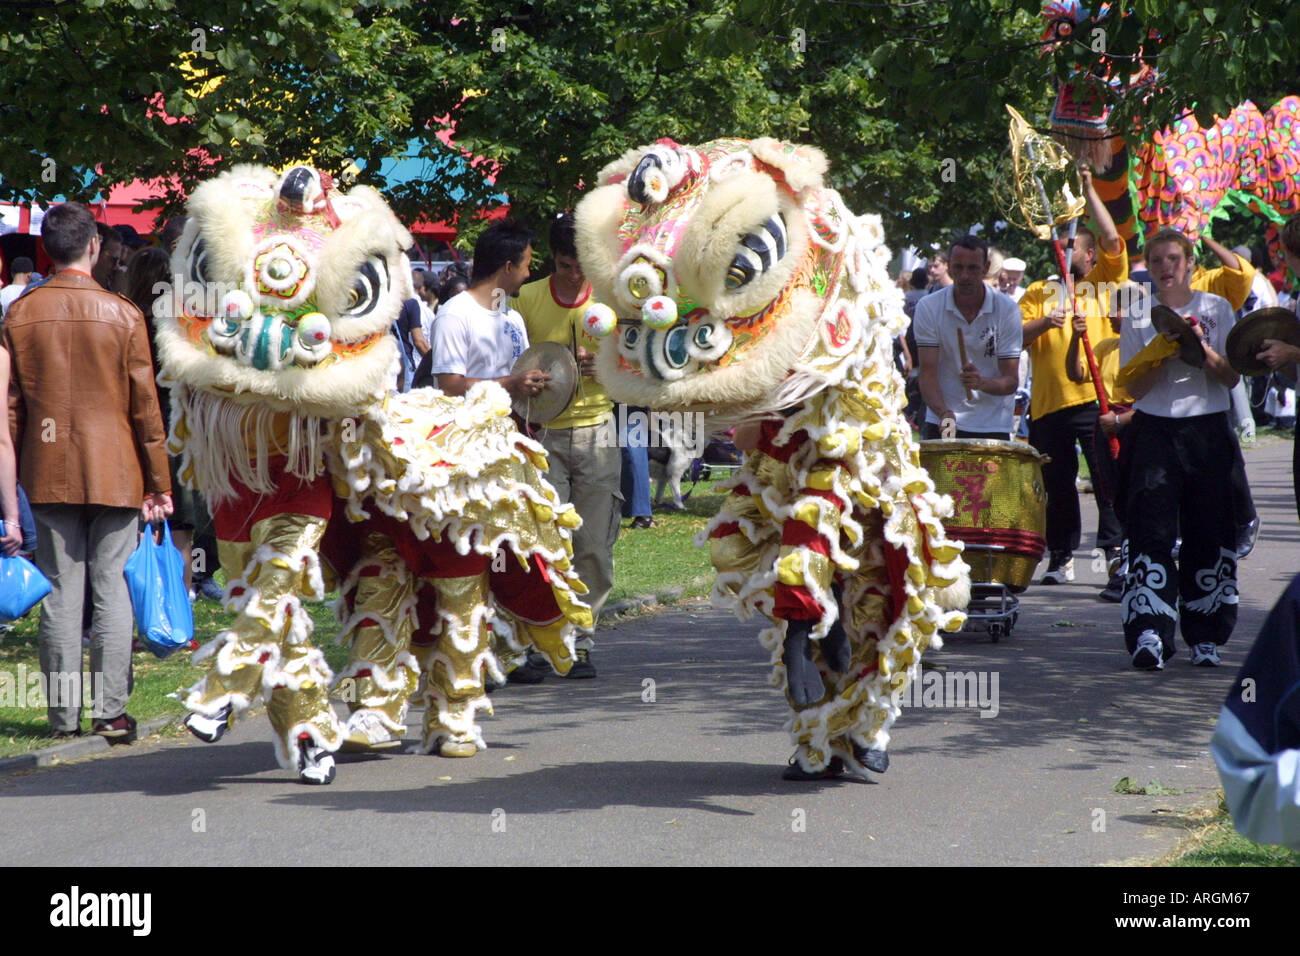 Chinese New Year celebration dragon - Stock Image